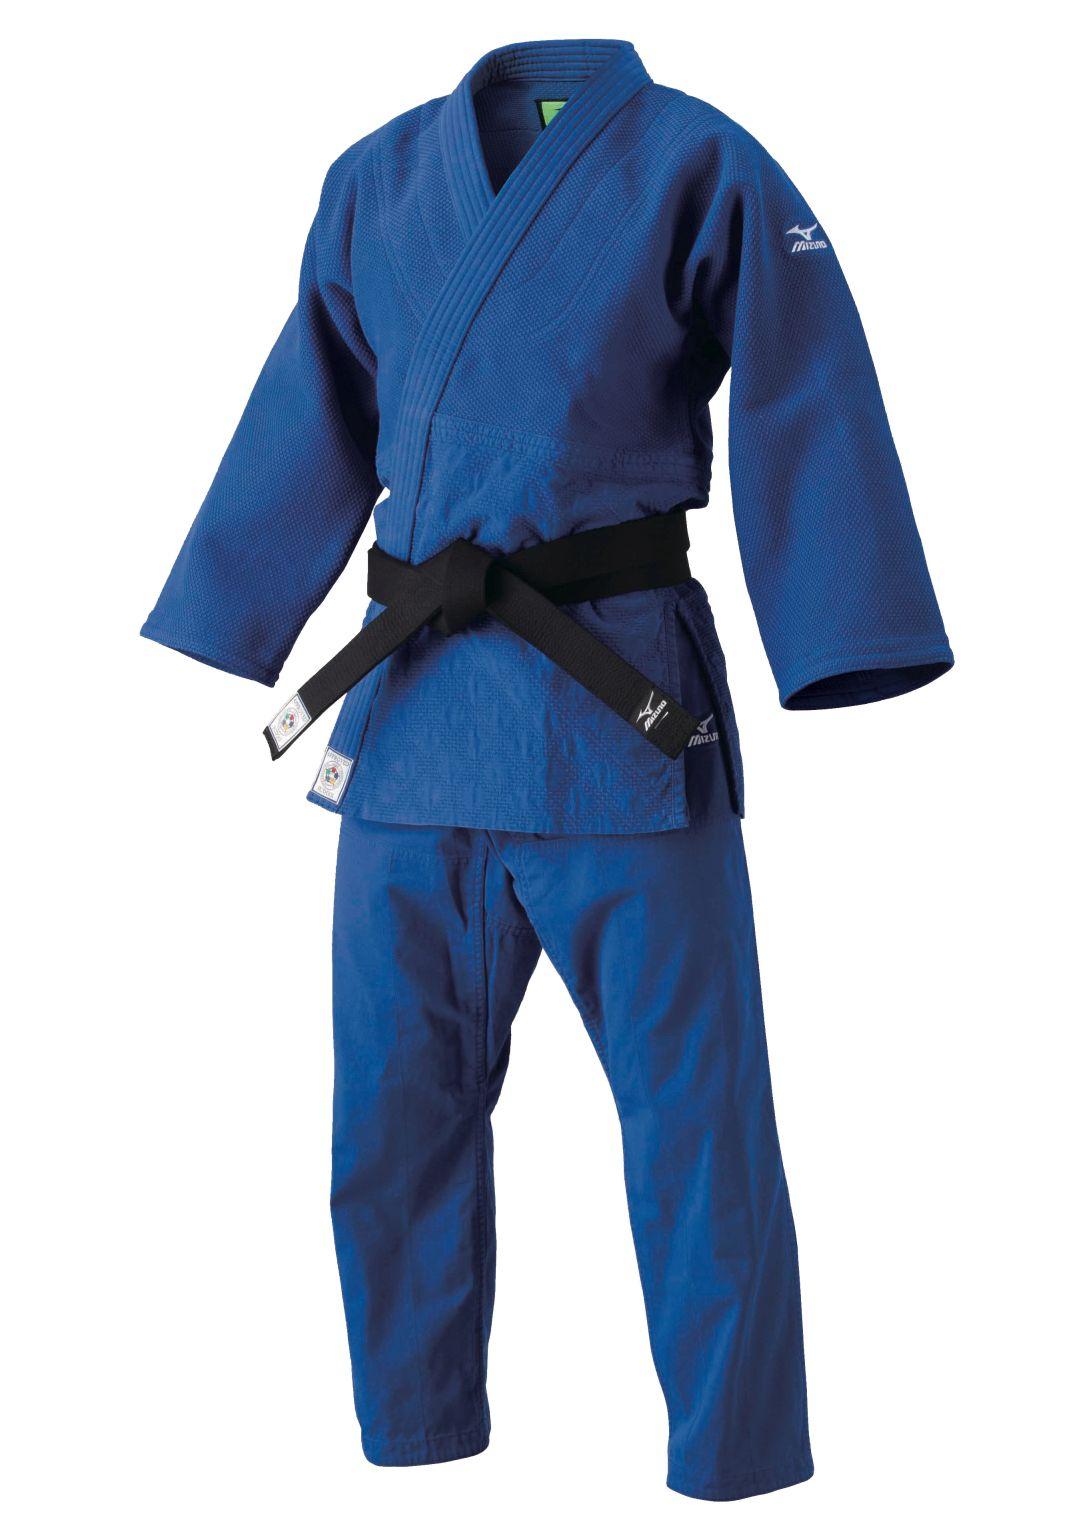 Gi adatta Iii al Yusho Judo LabelSi Blau Mizuno Red N8vmwn0O